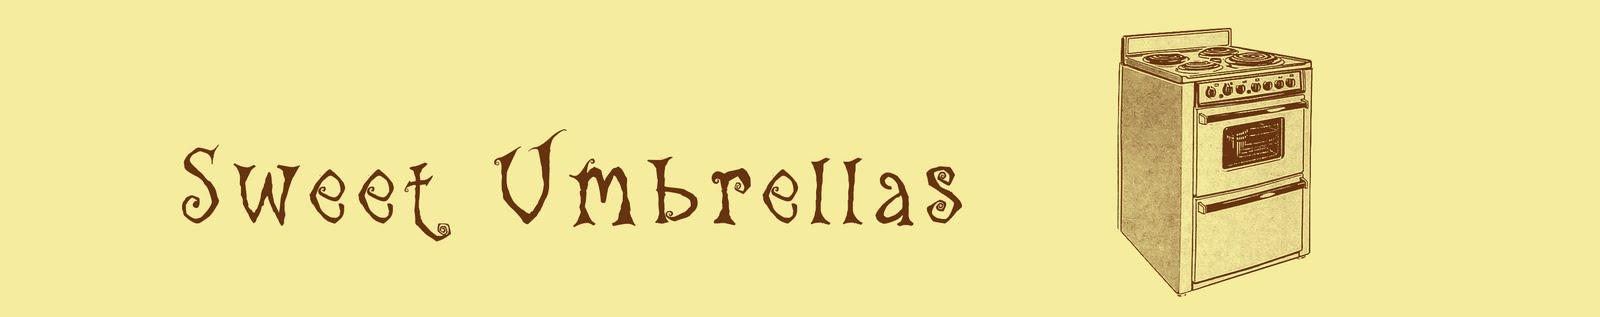 Sweet Umbrellas — New Content Posts Wednesdays